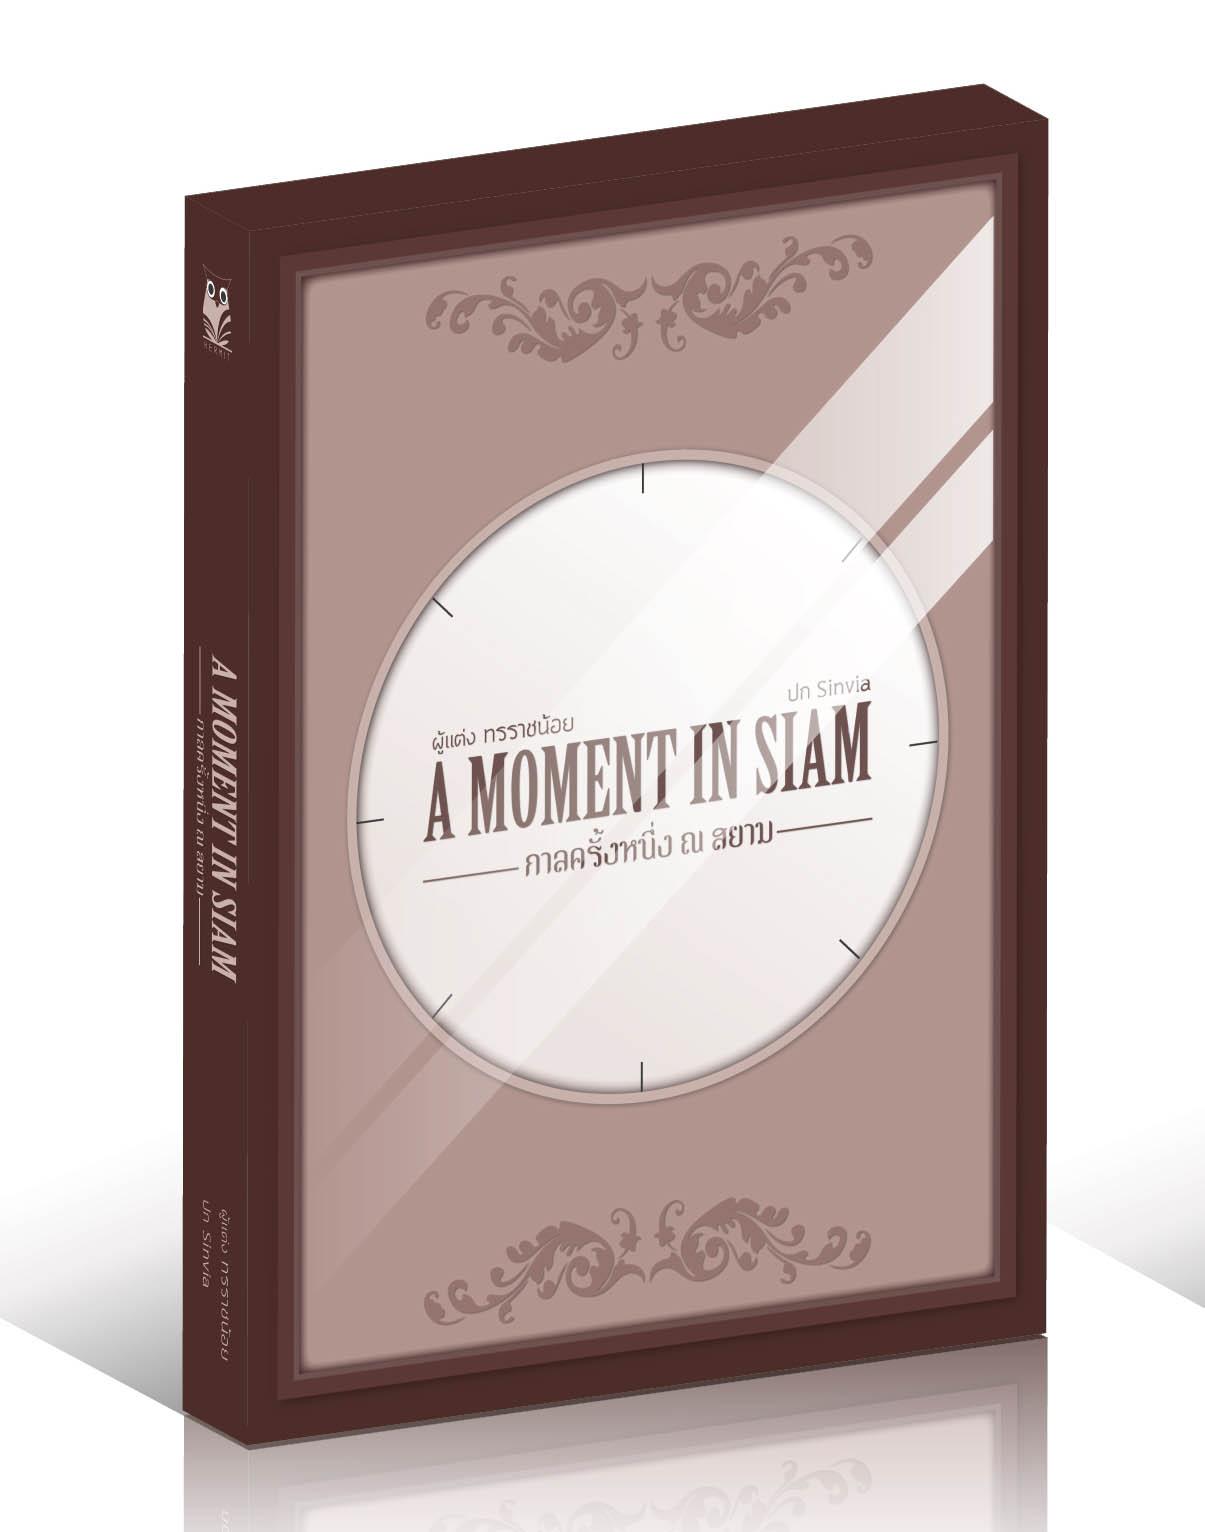 [ Pre order ] ฺBoxset A moment in Siam กาลครั้งหนึ่ง ณ สยาม ผู้เเต่ง ทรราชน้อย